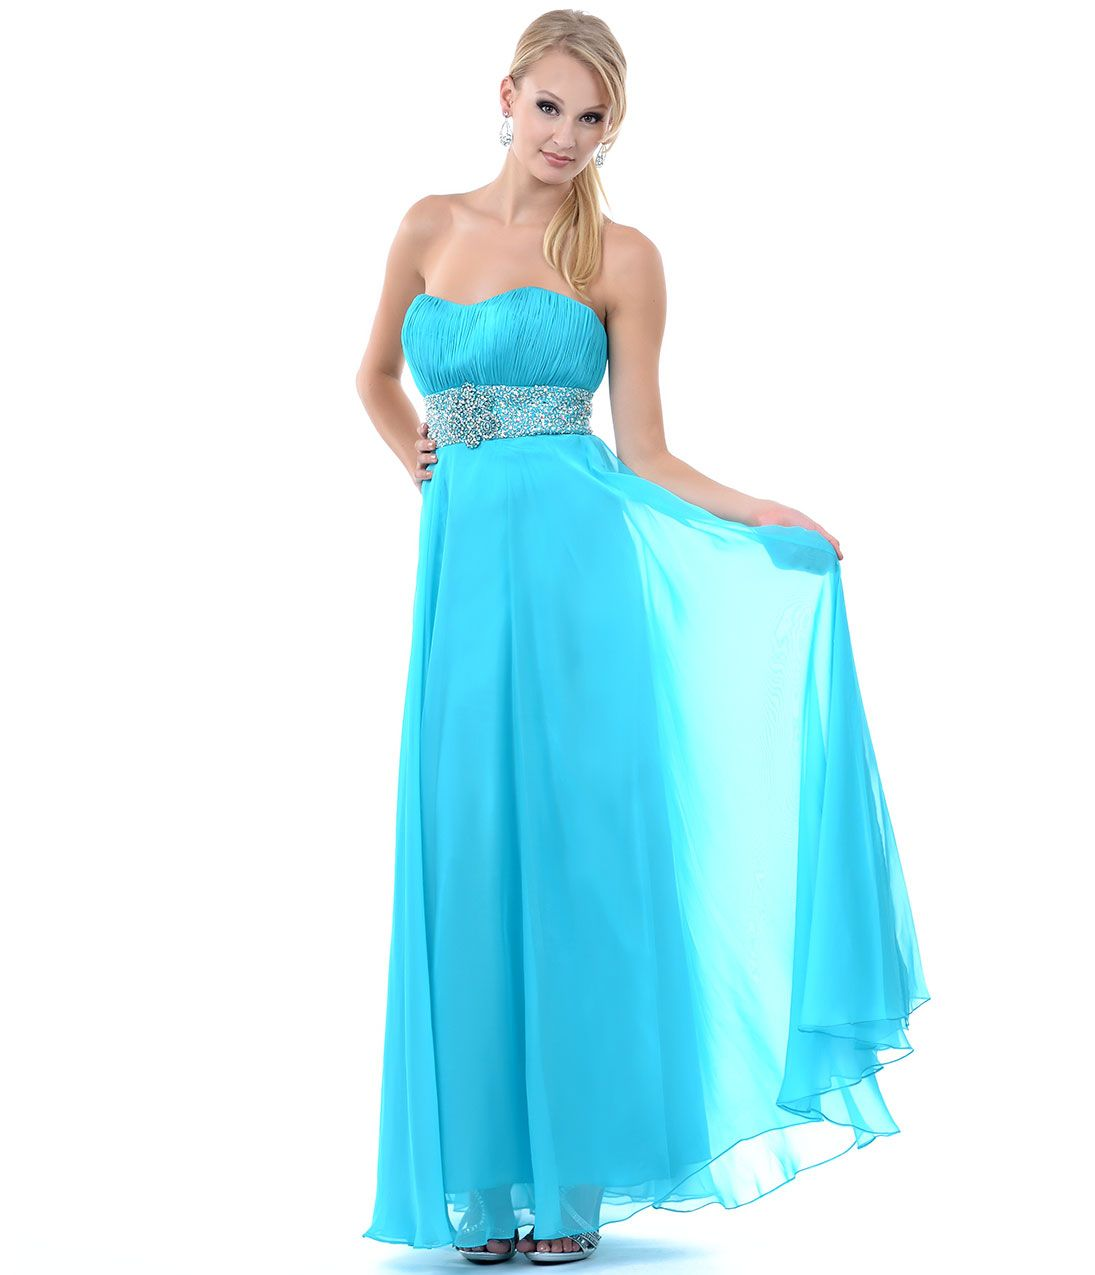 Aqua Ruched Sequin & Gem Strapless Long Dress #uniquevintage | prom ...